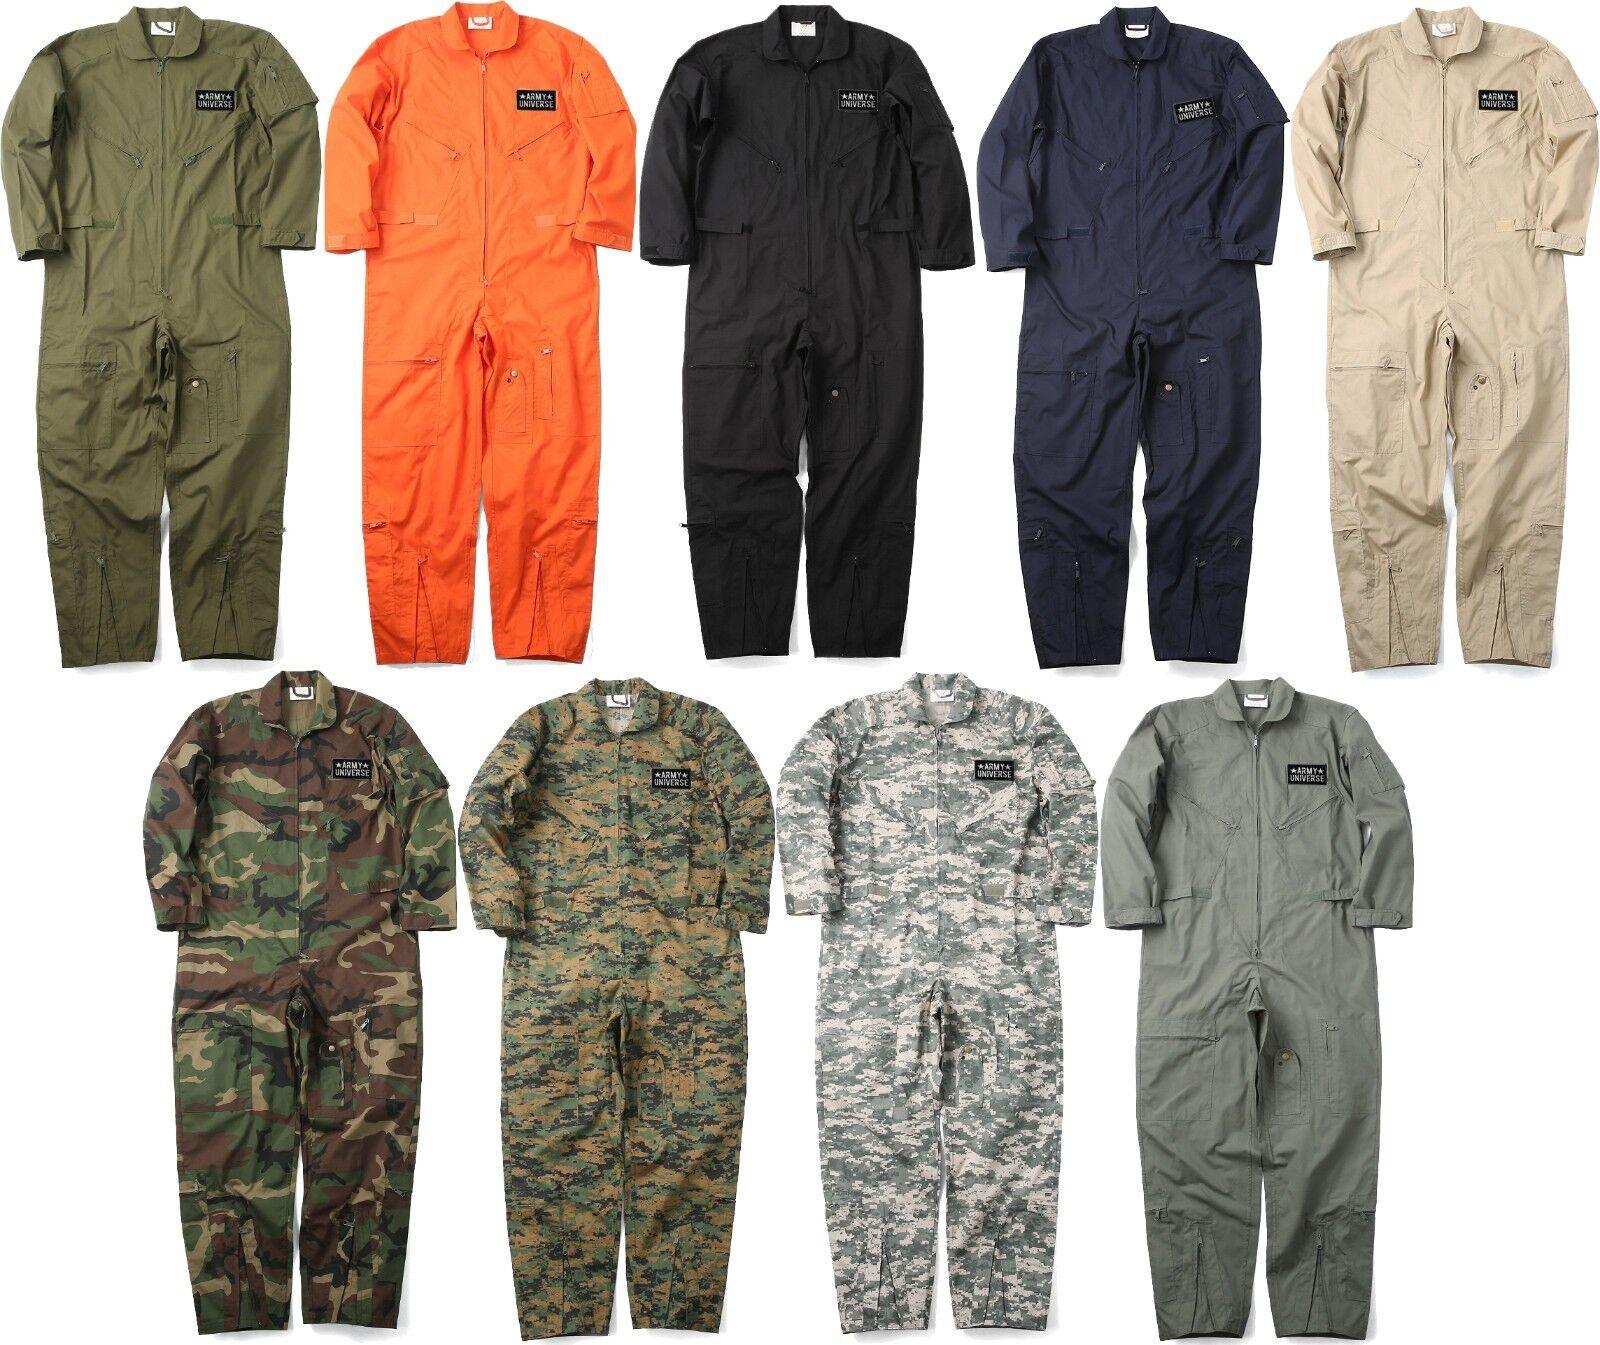 5ede08e57150 Military Uniform Flight Suit Air Force Style Fighter Coveralls Jumpsuit +  Patch